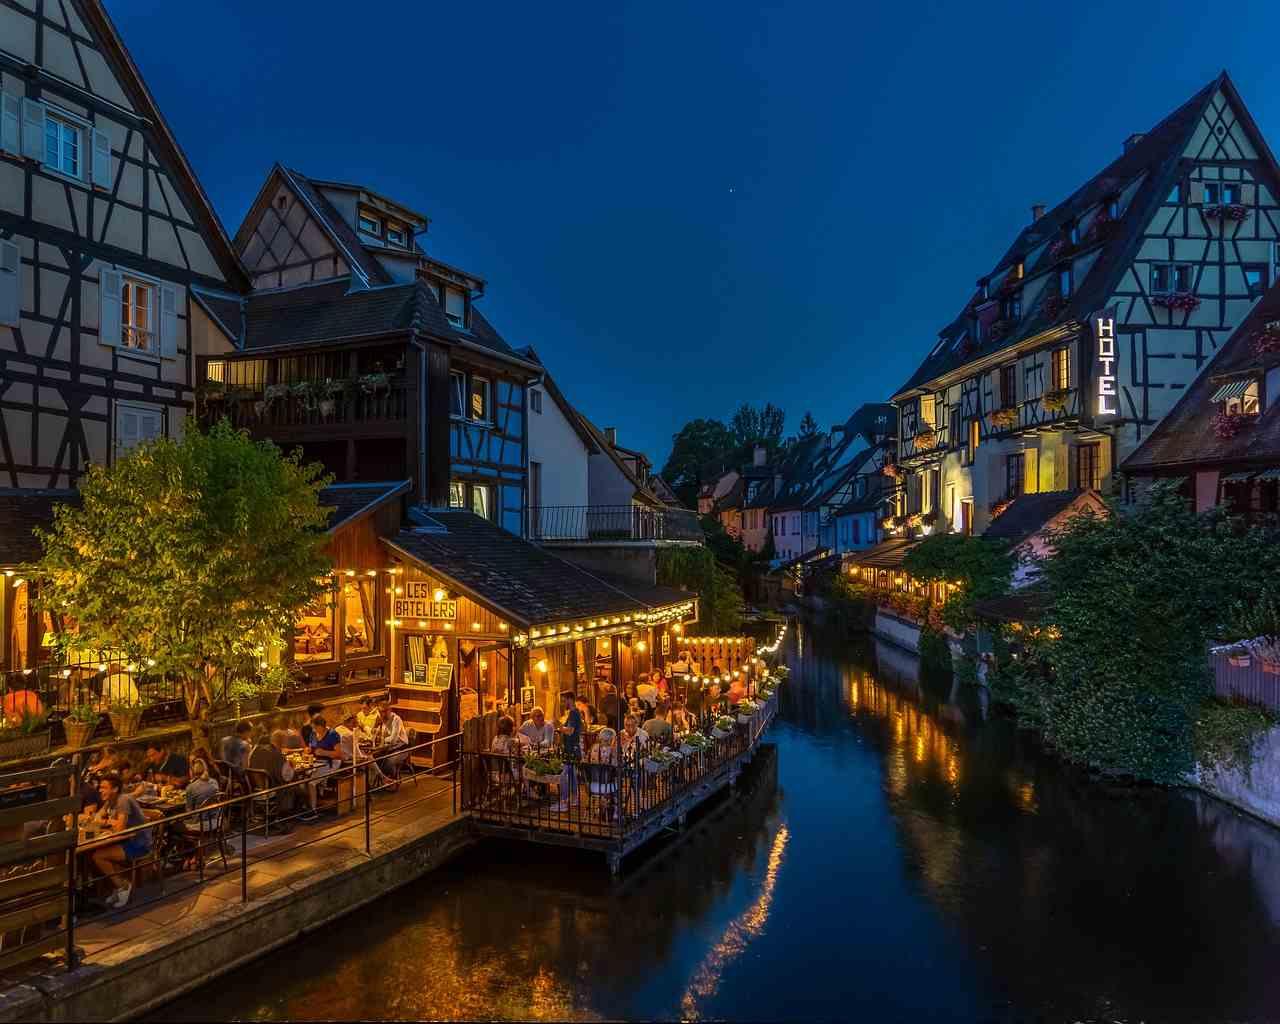 Consider Top Travel Destination Colmar, France